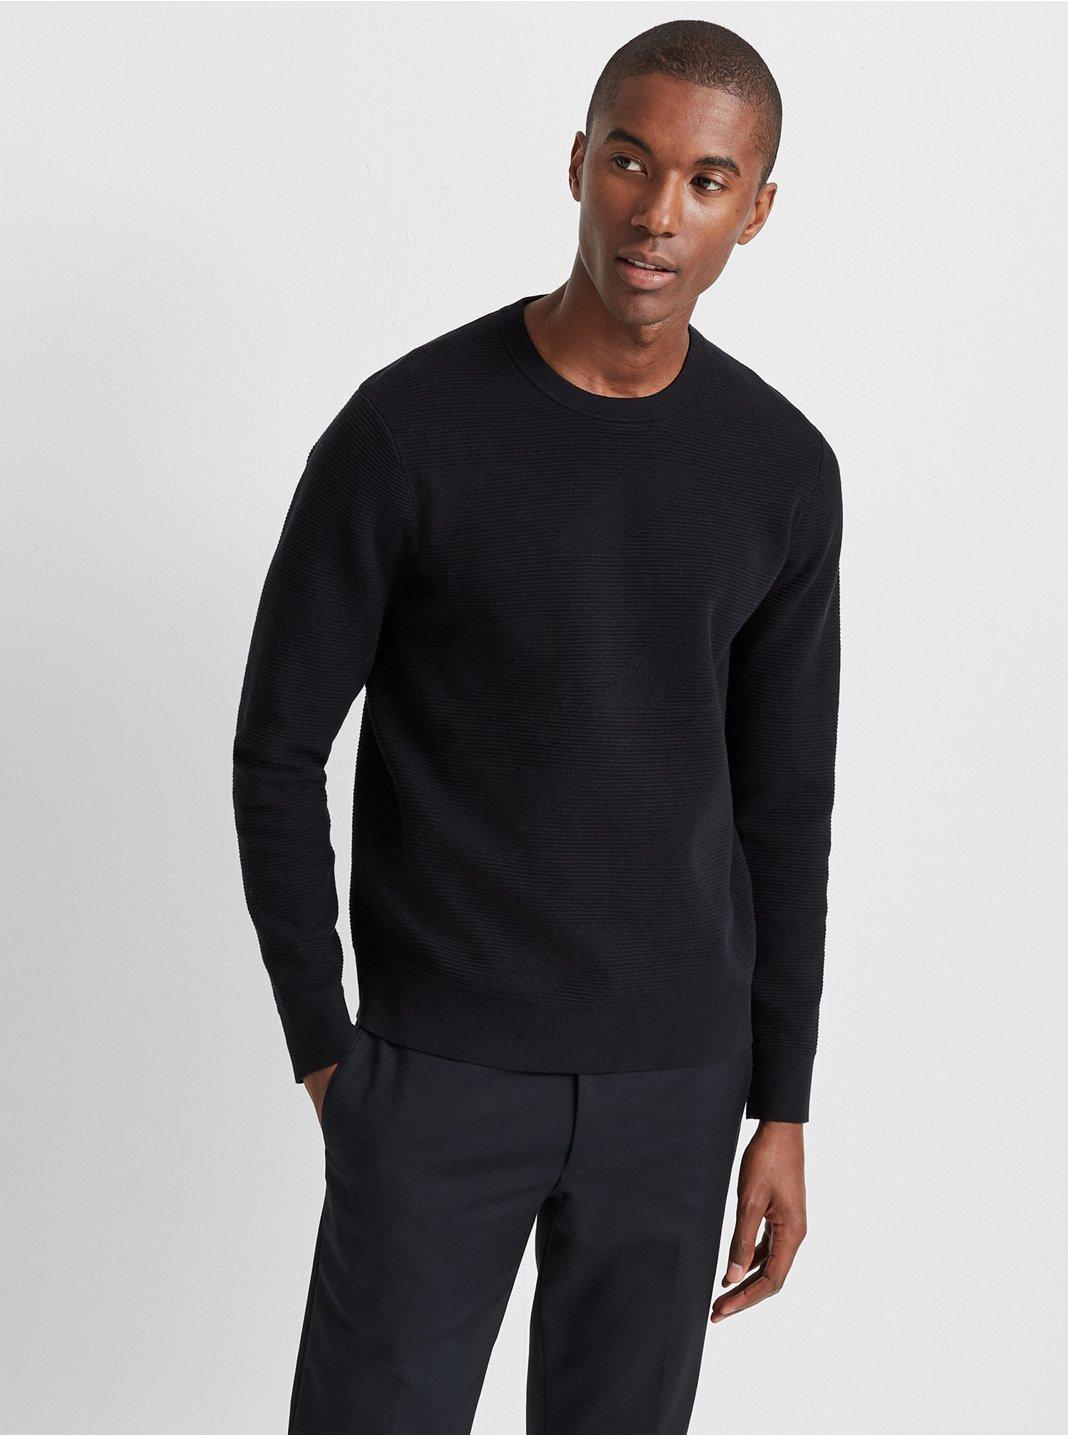 8e93d6eec72 Men's Sweaters | Club Monaco